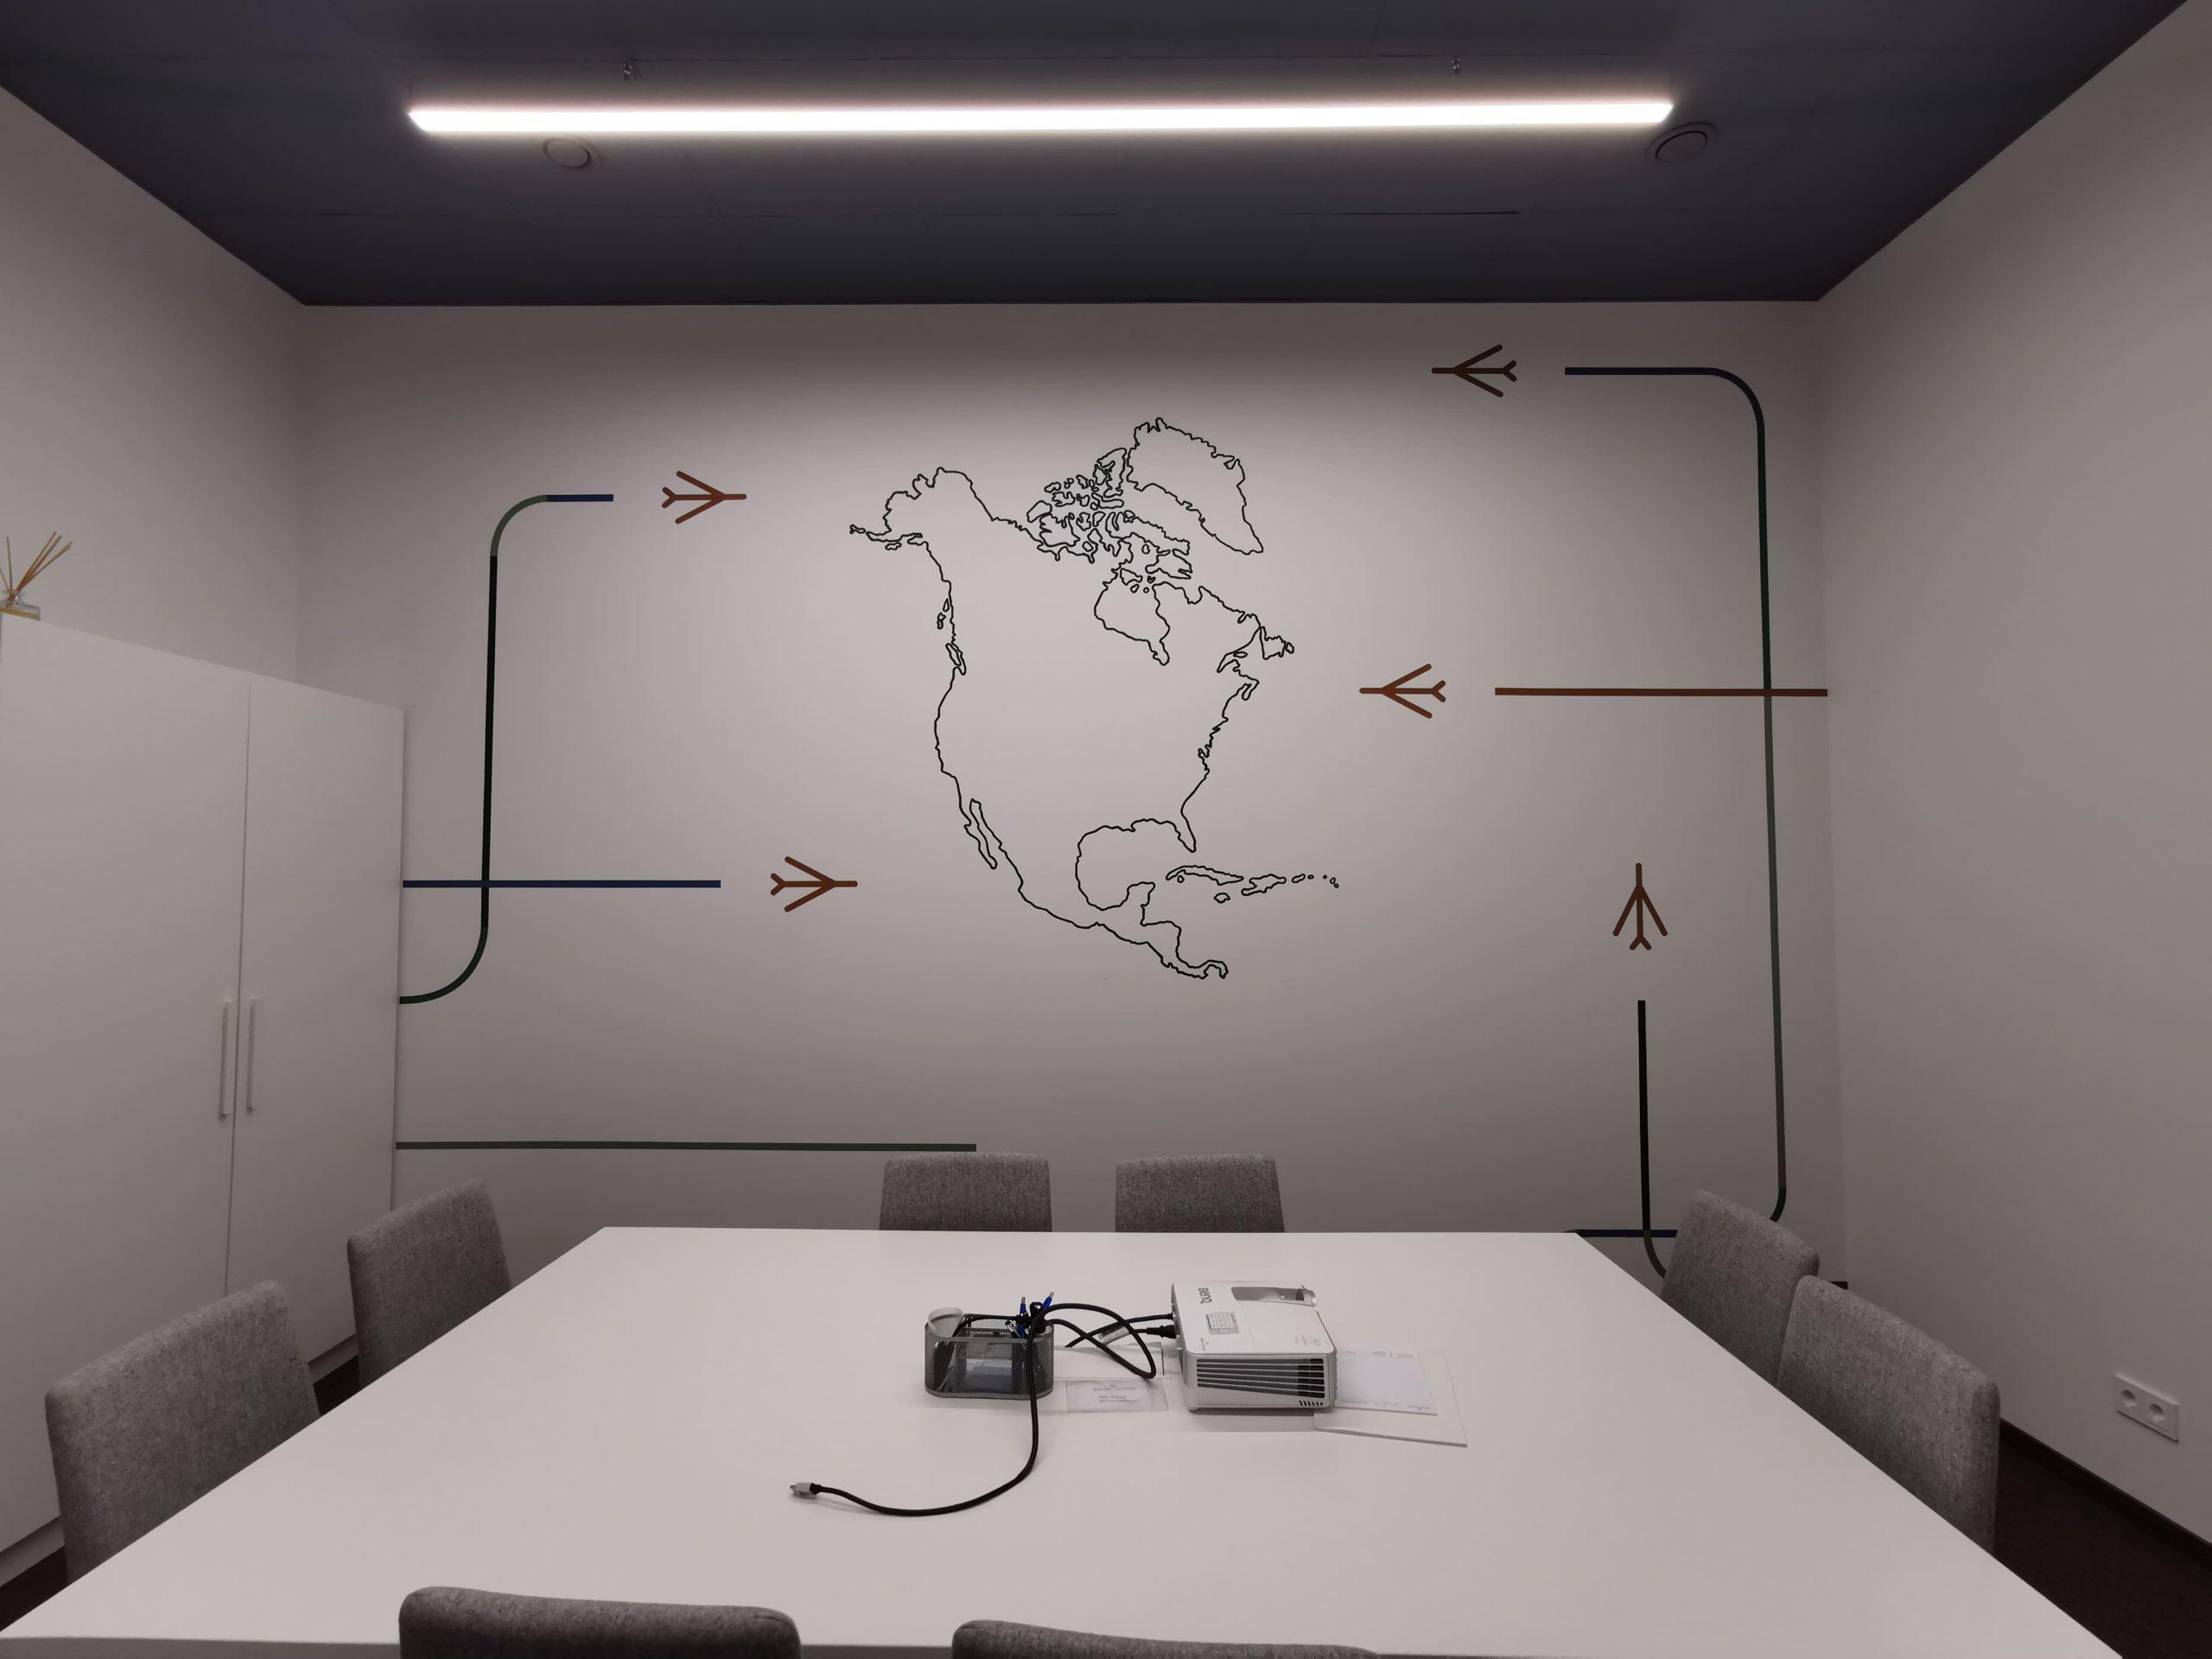 menine-kuryba-sienu-dekoravimas-biurai (12)